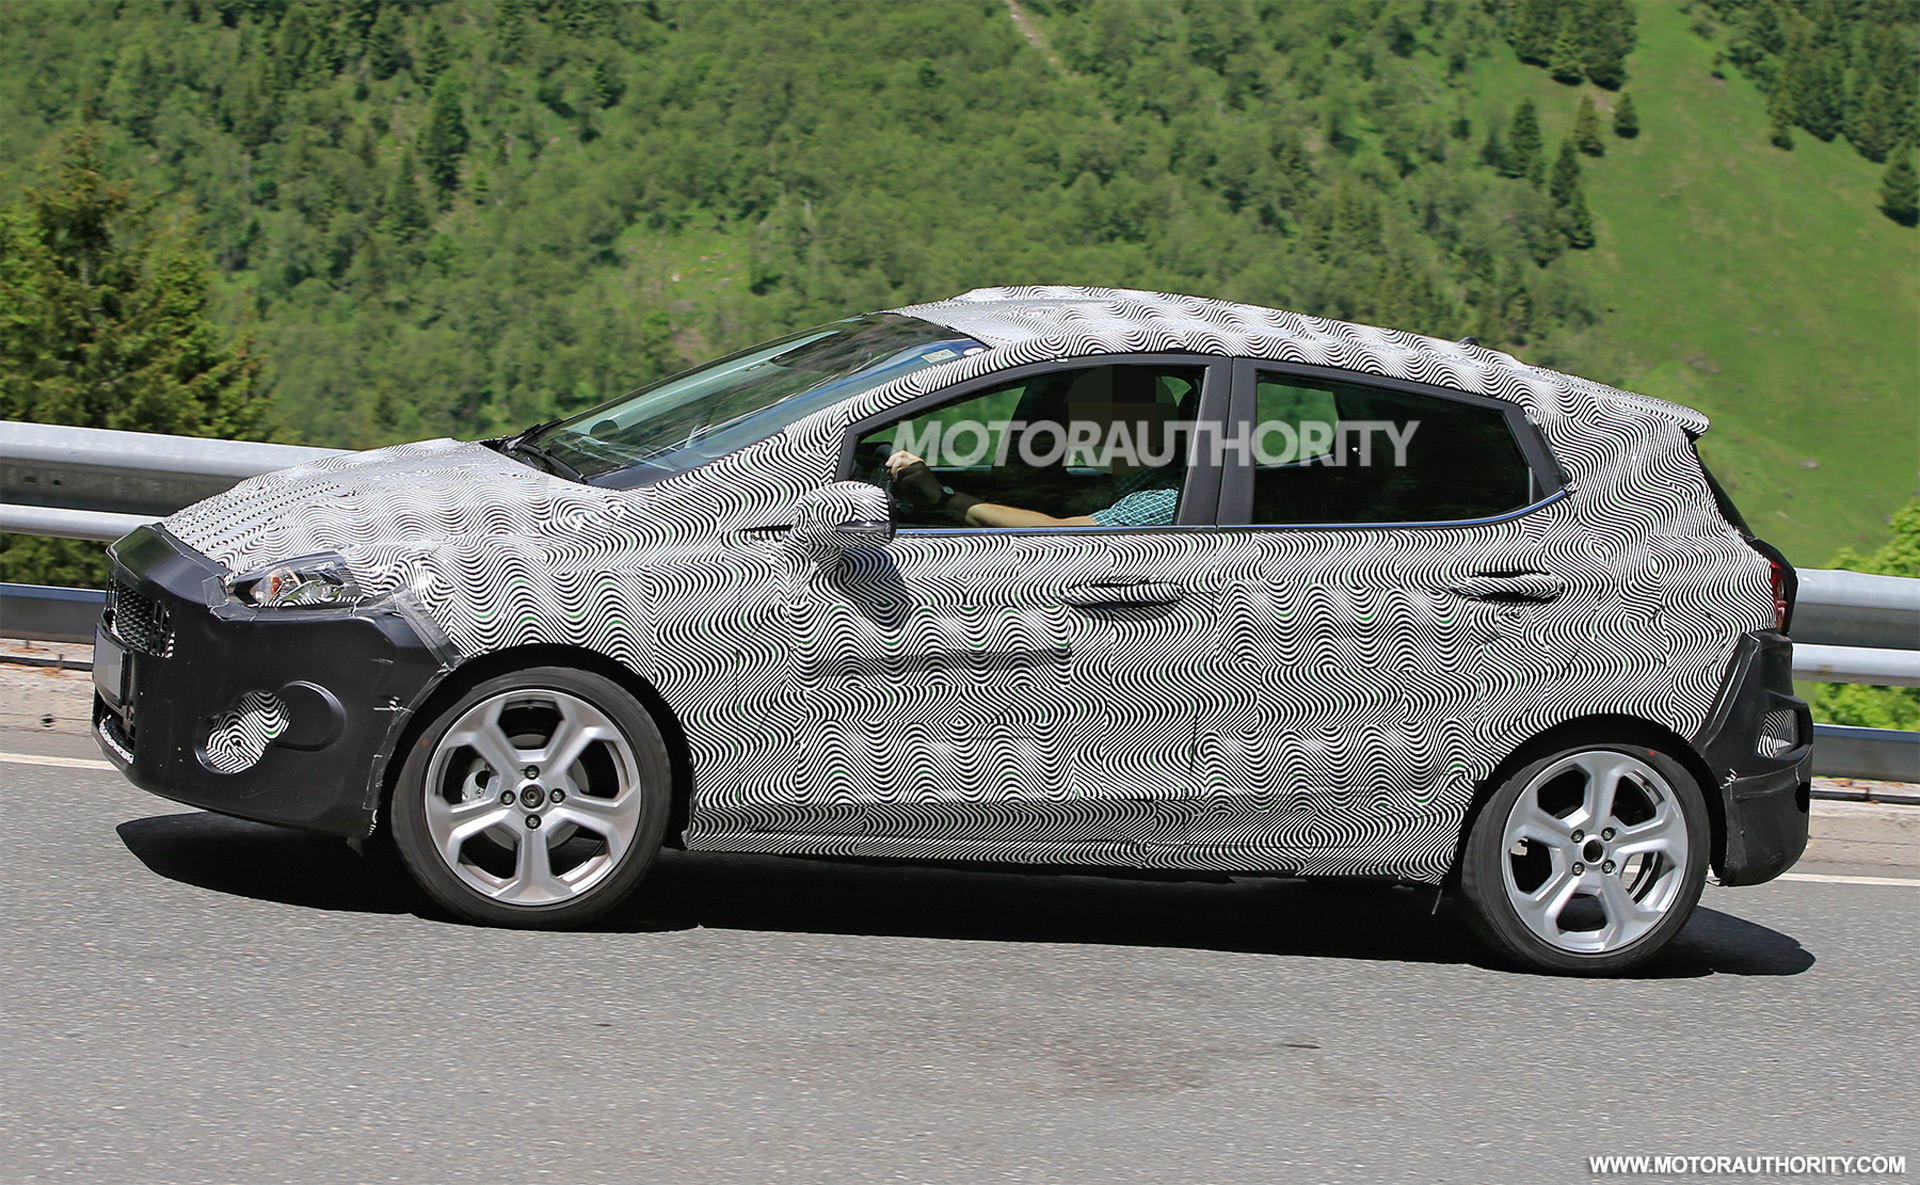 2017 - [Ford] Fiesta MkVII  - Page 3 2018-ford-fiesta-spy-shots--image-via-s-baldauf-sb-median_100555629_h